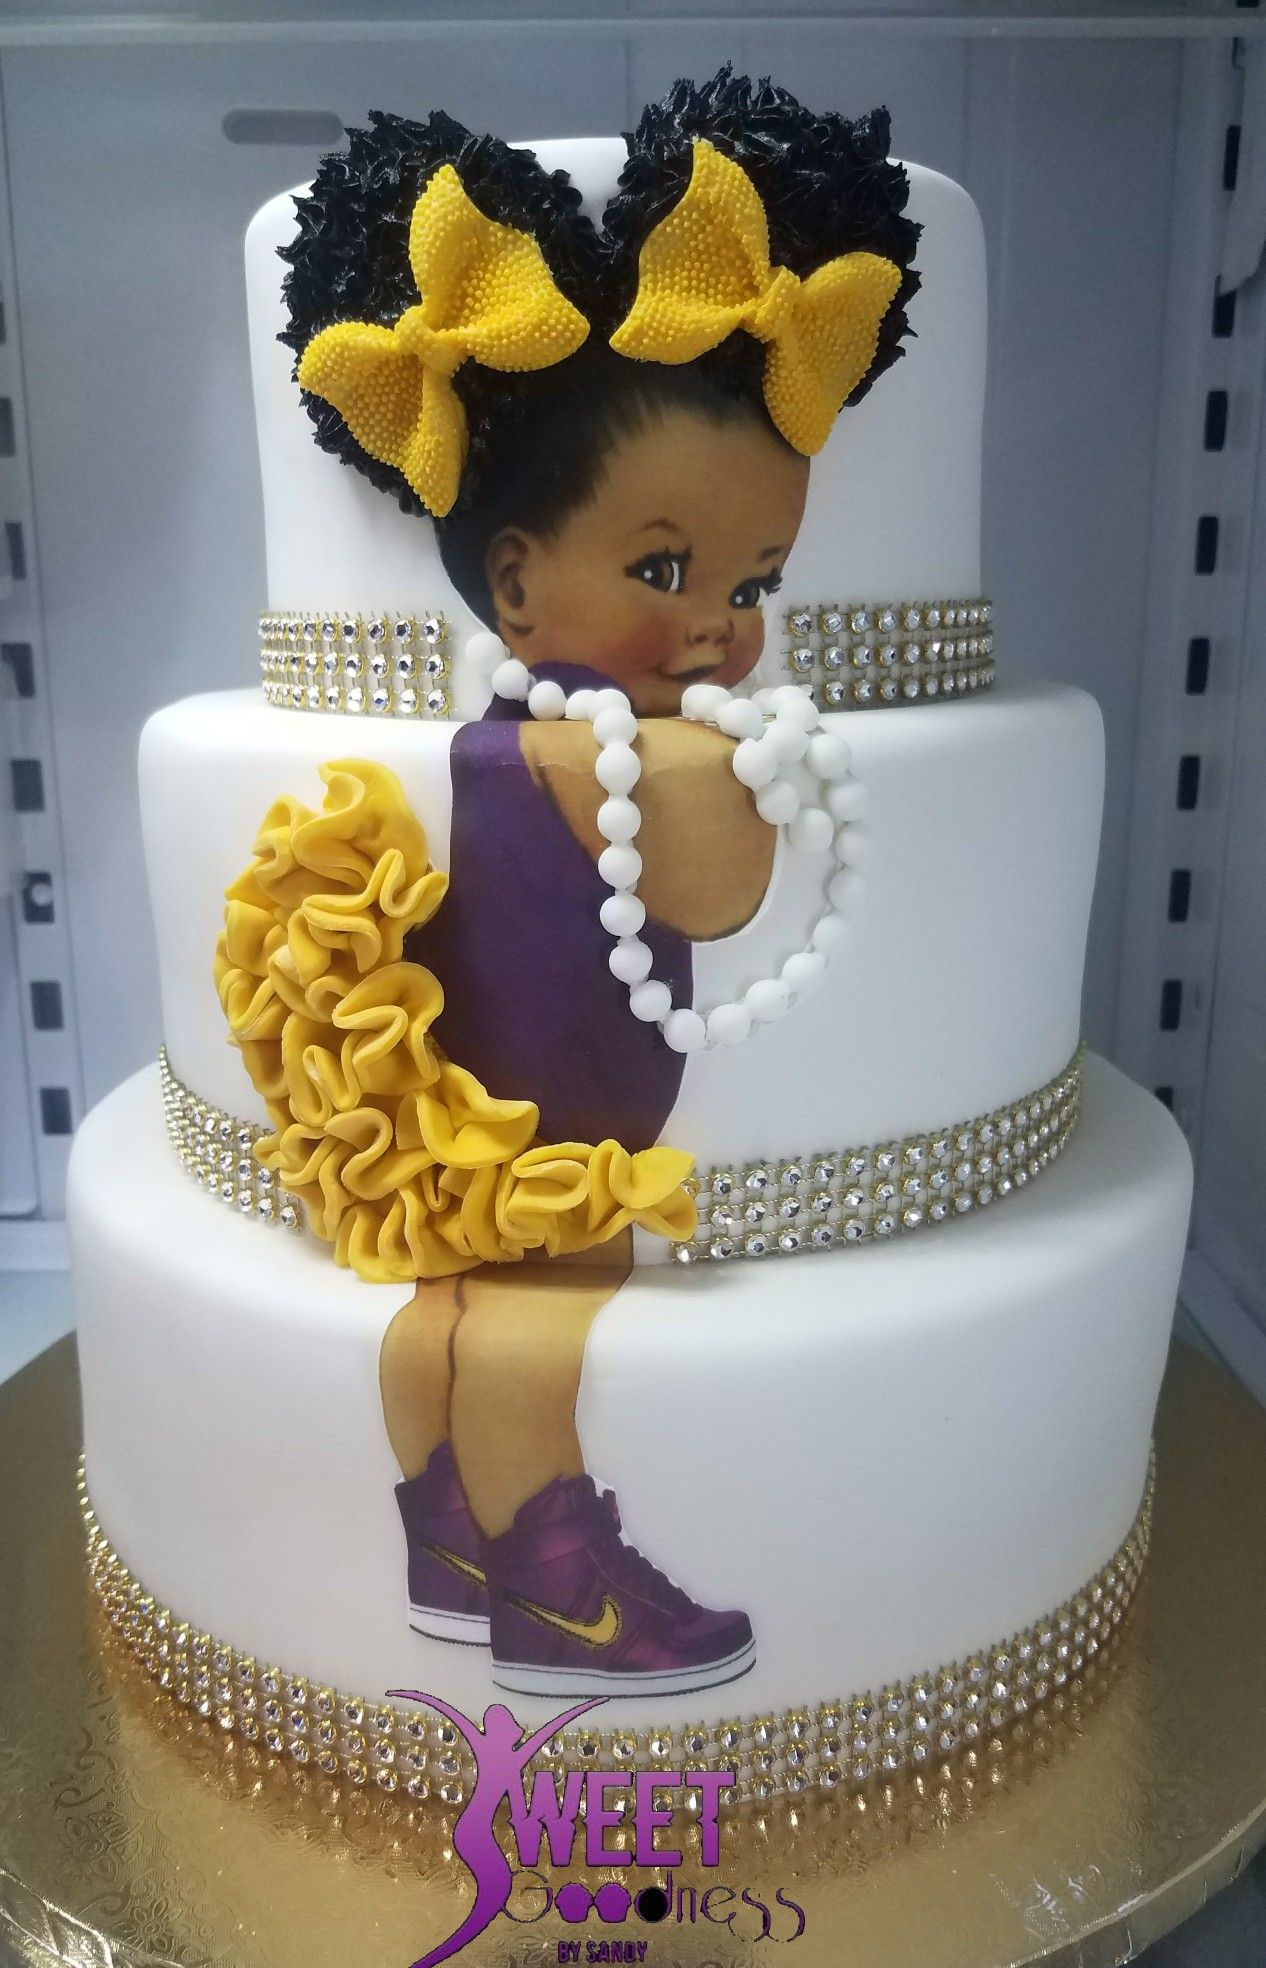 Afro baby cake baby cake doll cake birthday cake girls